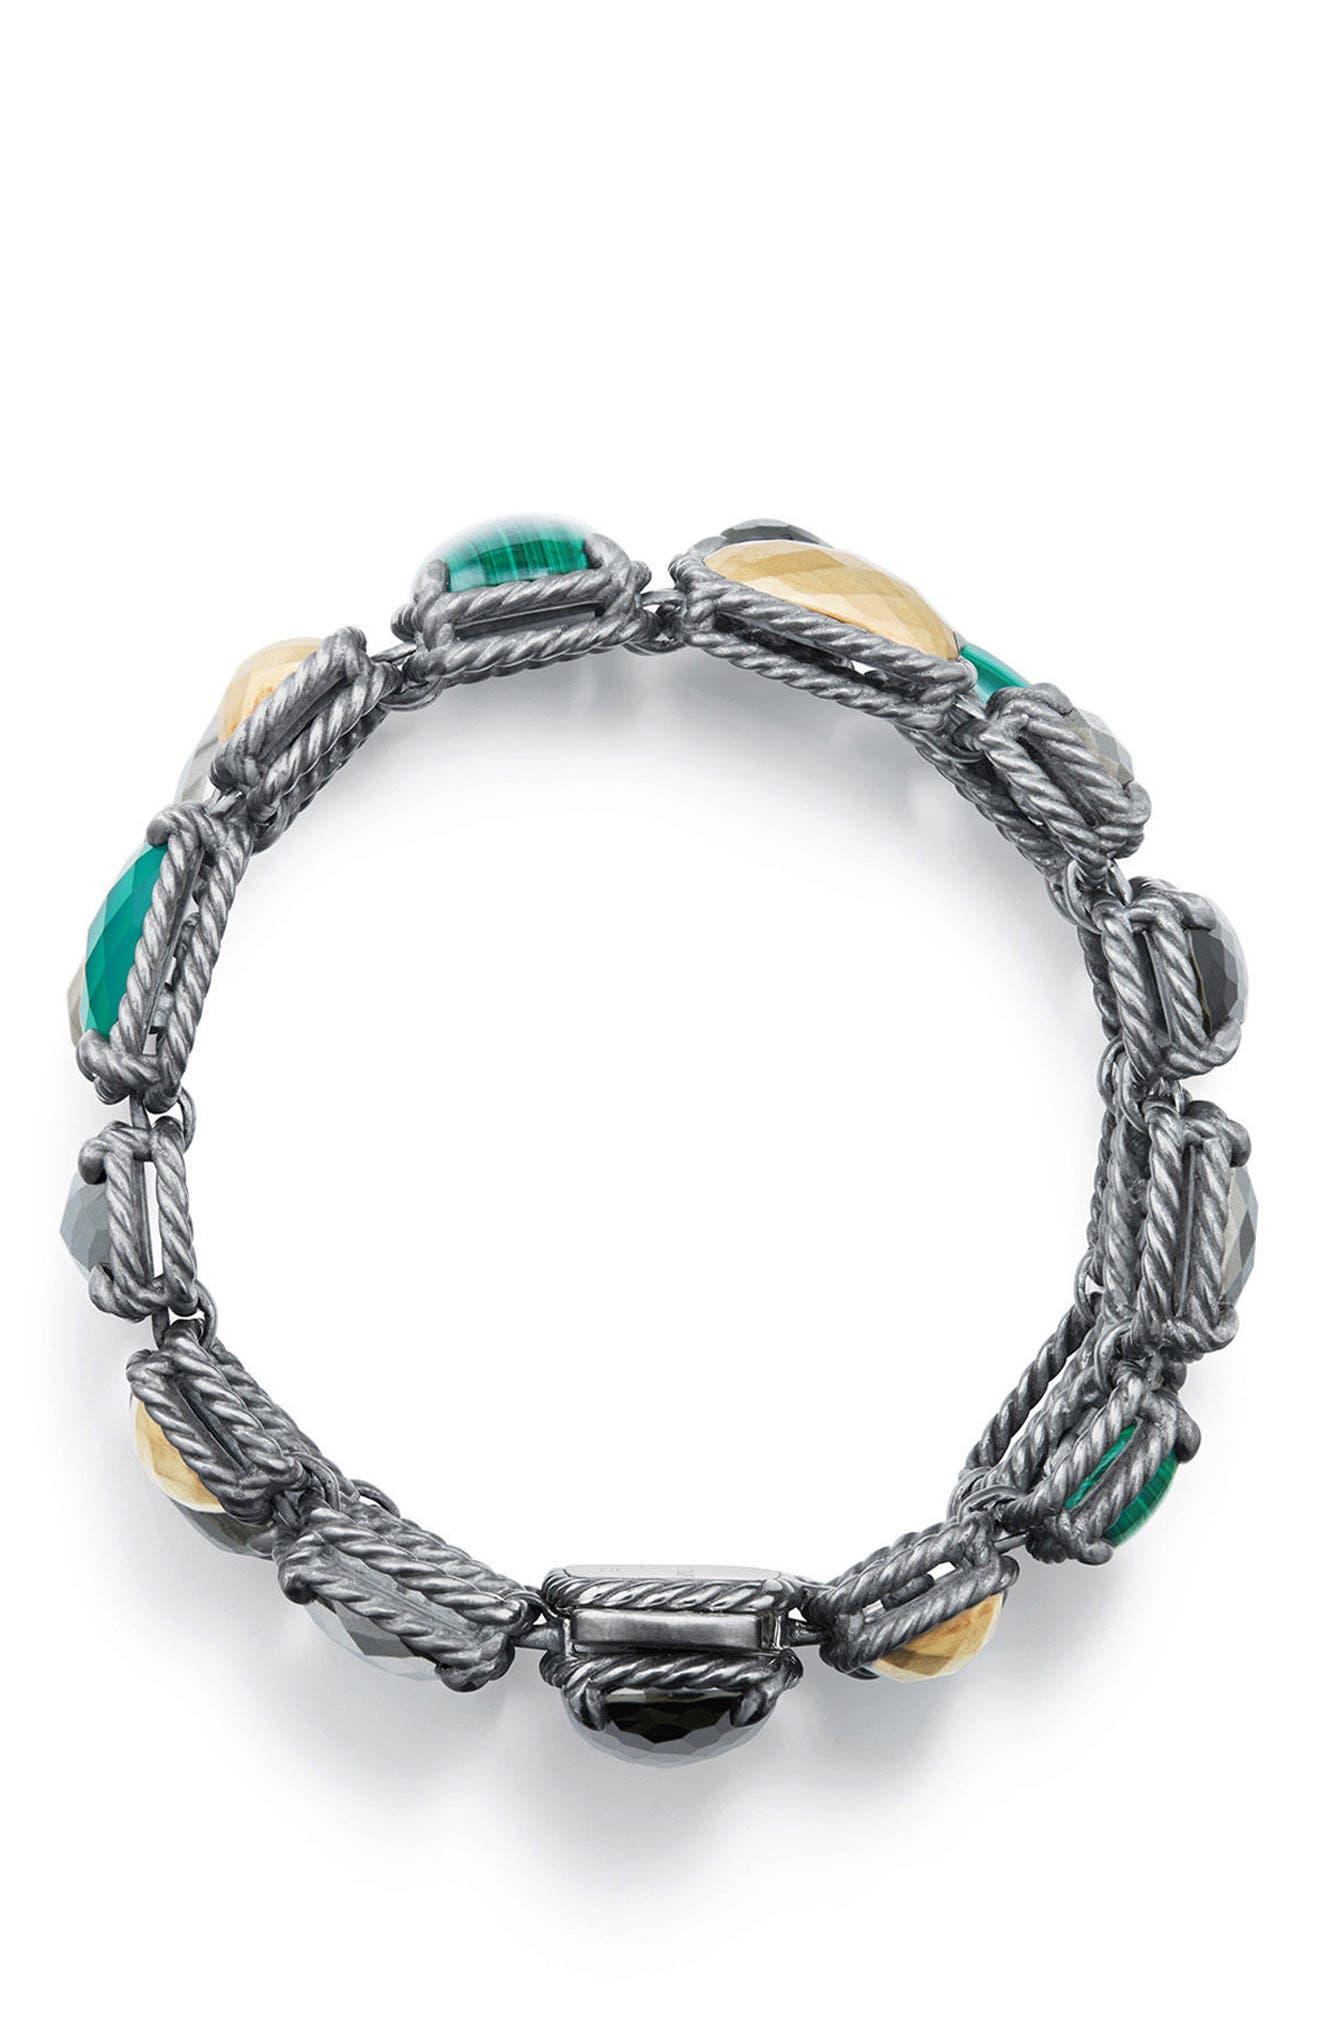 Chatelaine Mosaic Bracelet with 18K Gold,                             Alternate thumbnail 2, color,                             LEMON CITRINE/ HEMATINE